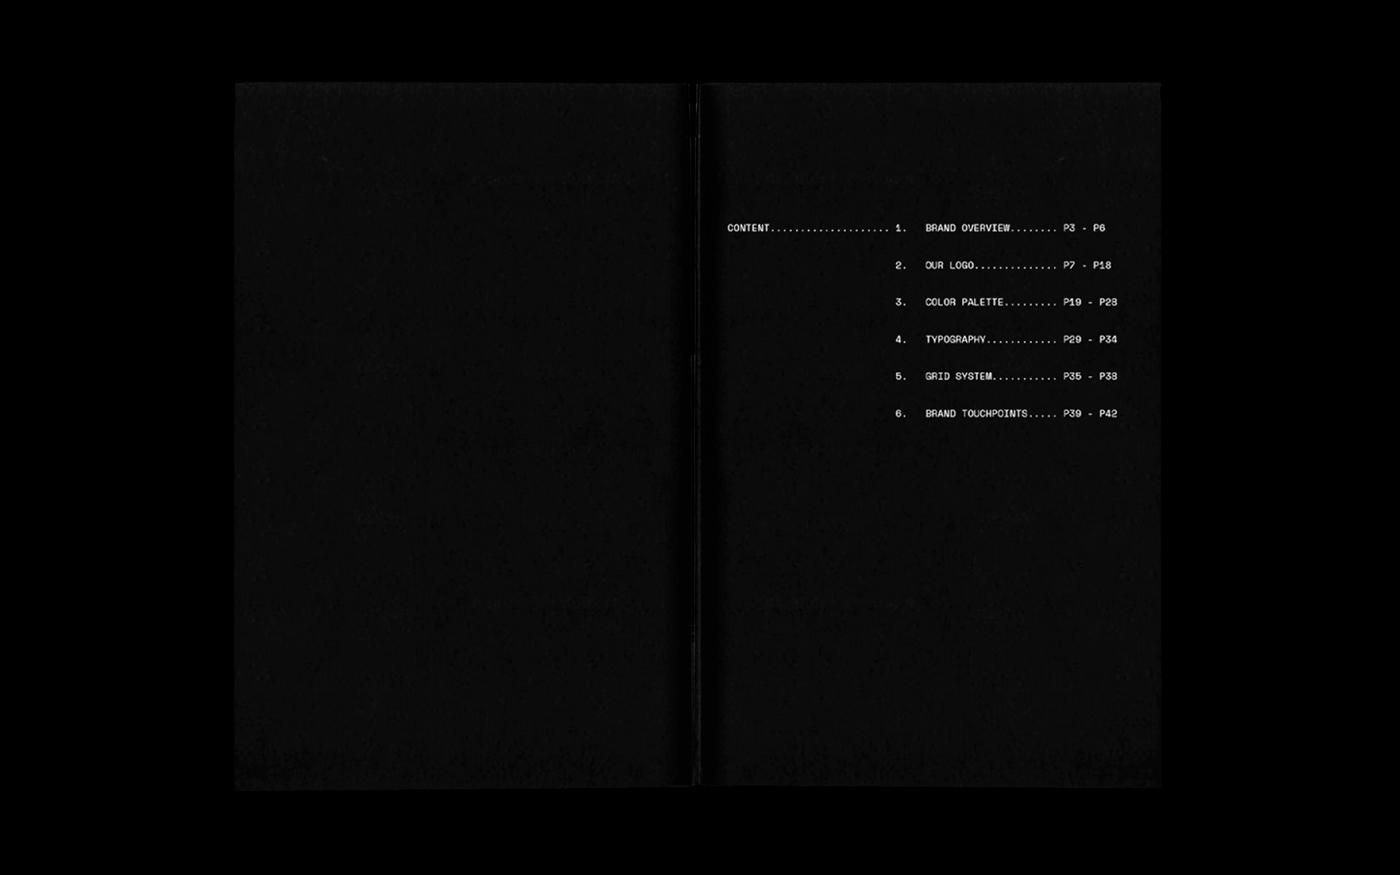 agency design Brand Development branding  design studio helvetica Identity Design Identity System logo typography   visual system